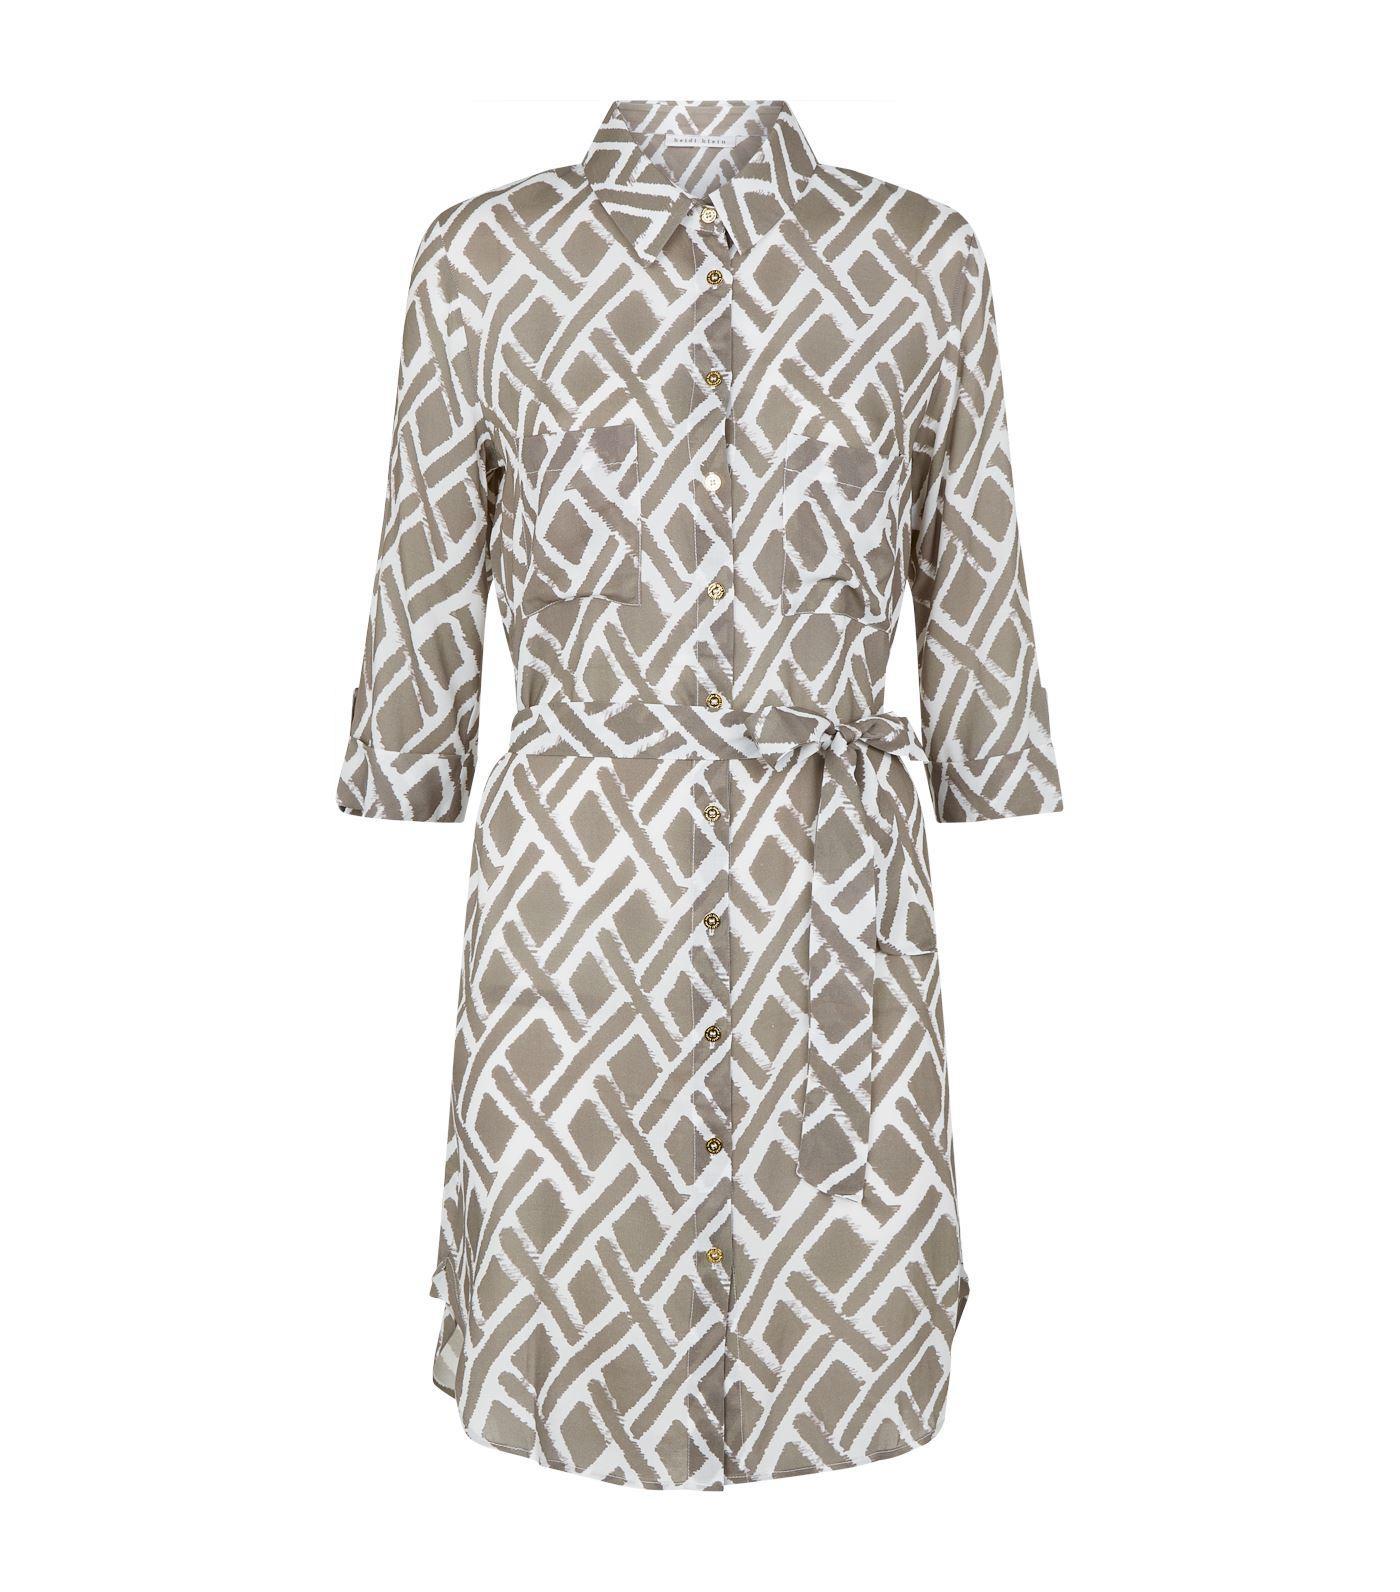 60925a44fb Heidi Klein Cote D'azur Relaxed Shirt Dress in Gray - Lyst